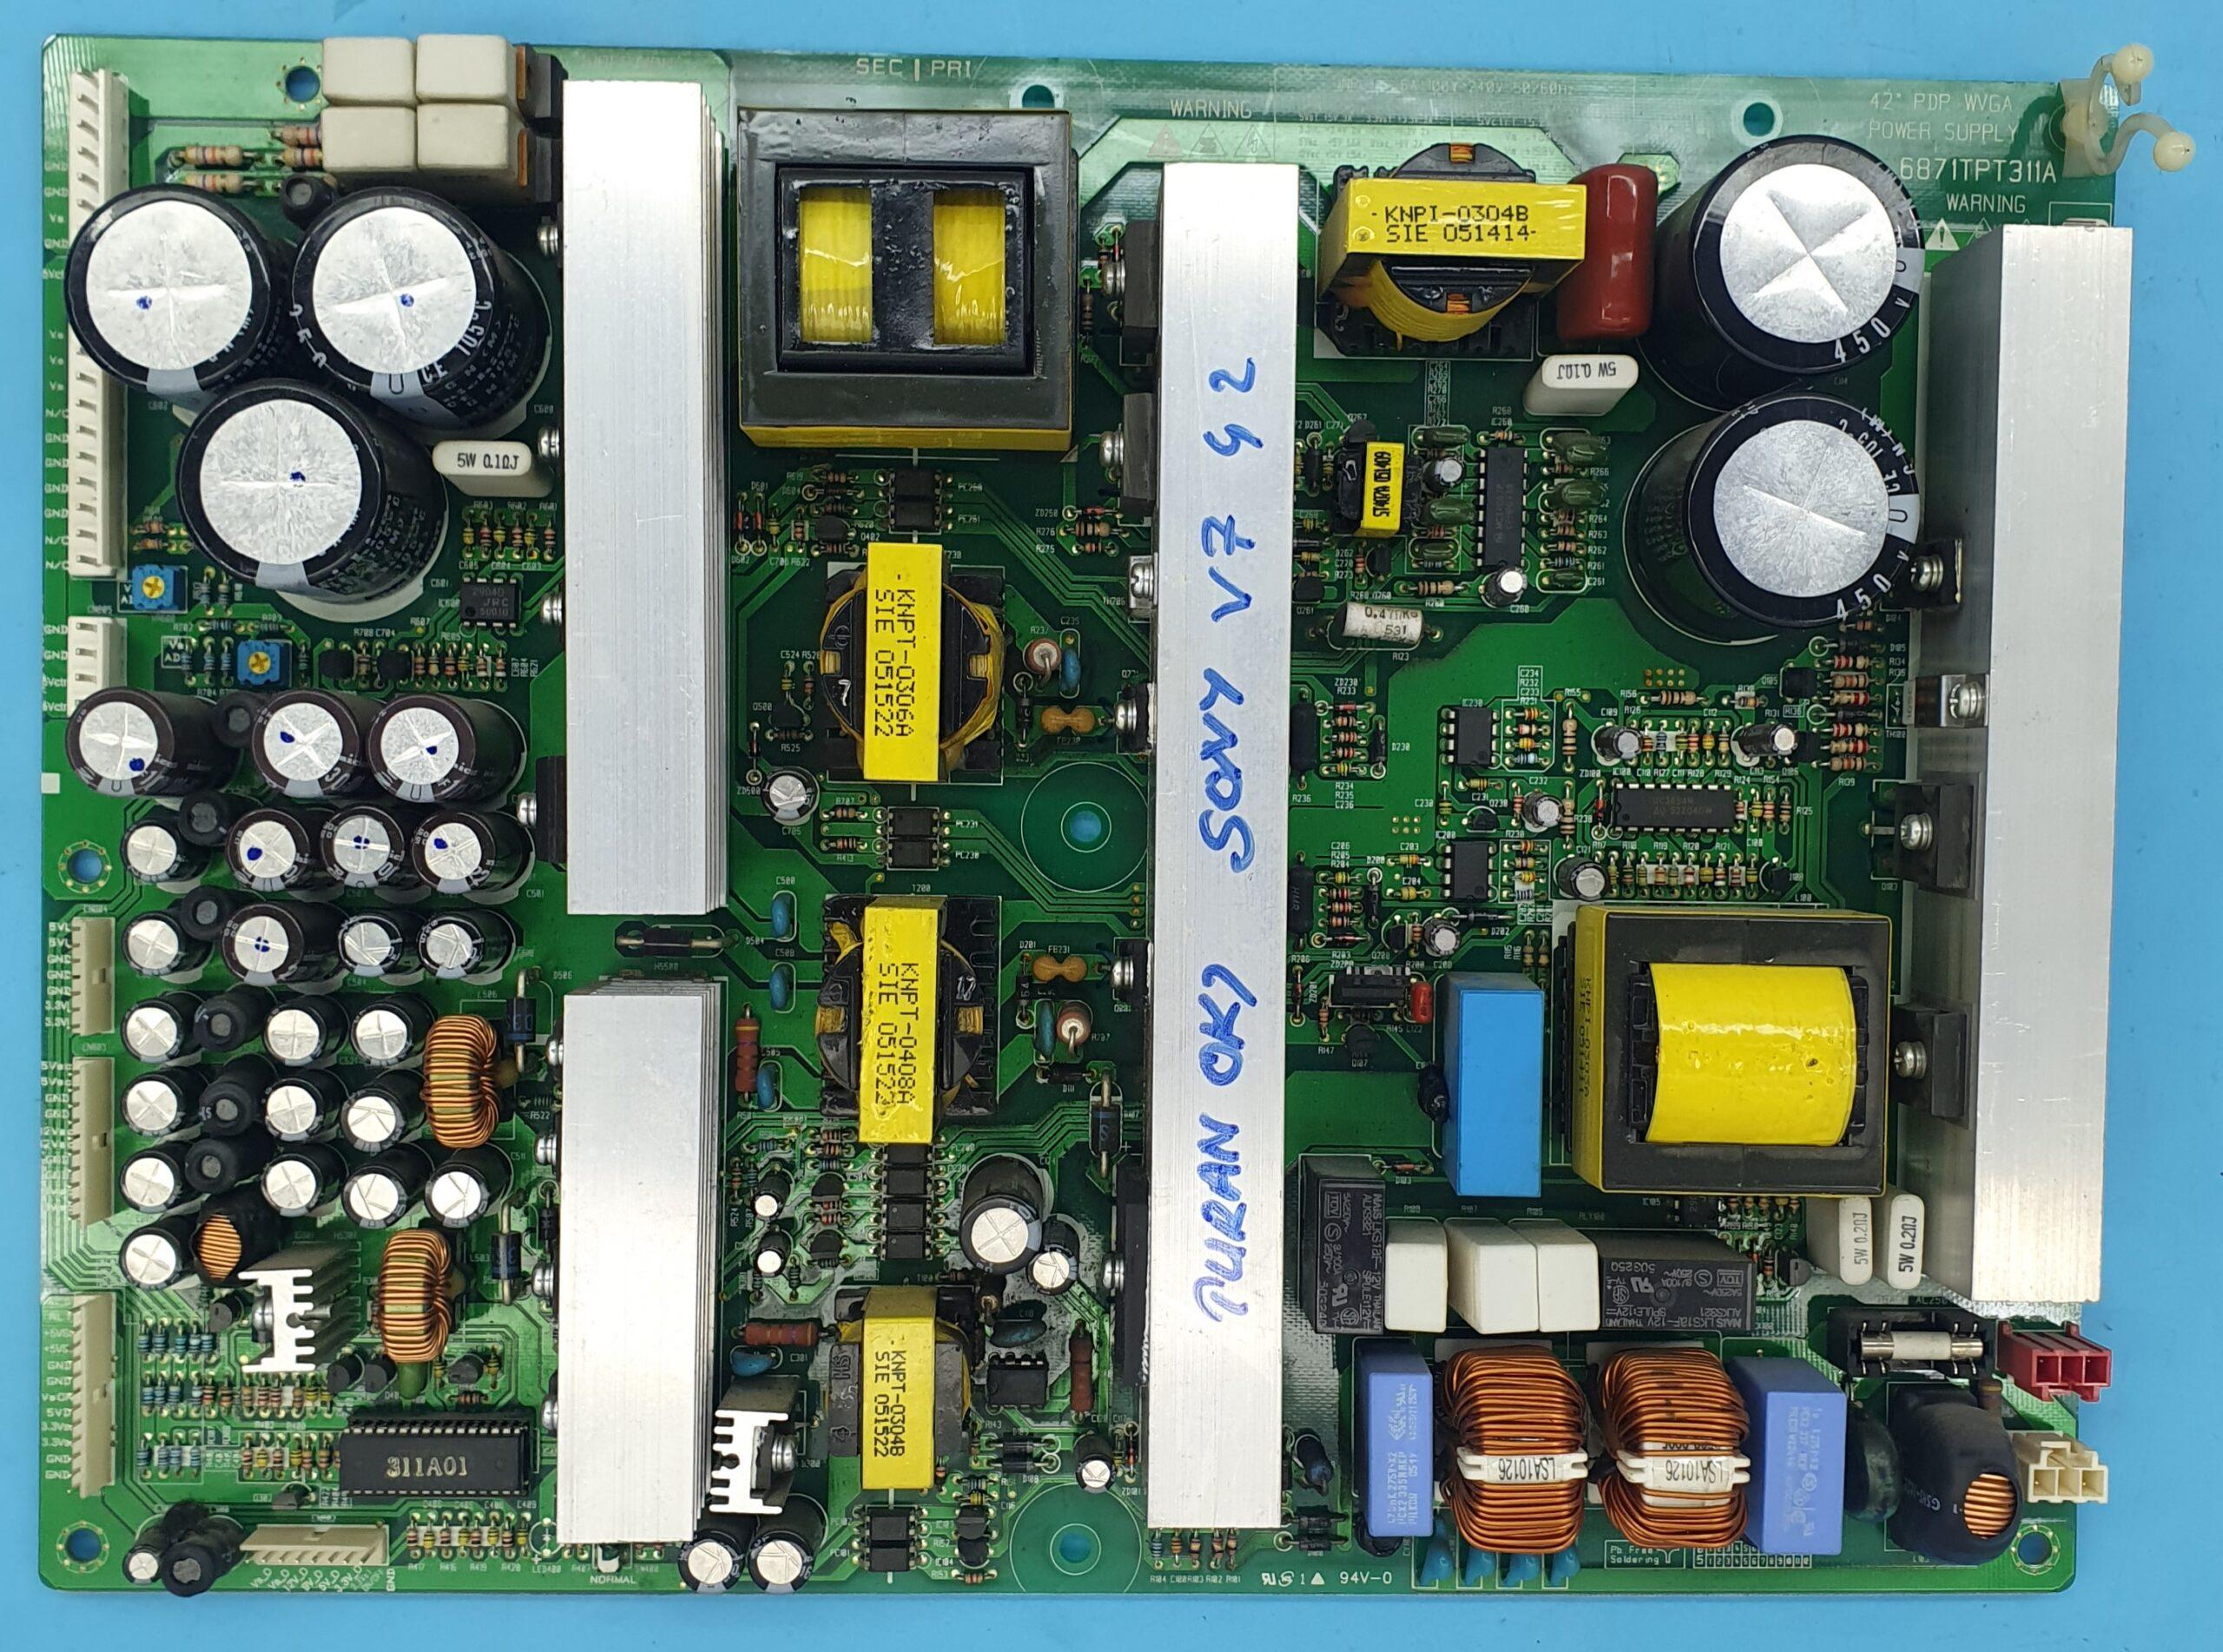 6871TPT311A Sony Power (KDV DAHİL = 200 TL)